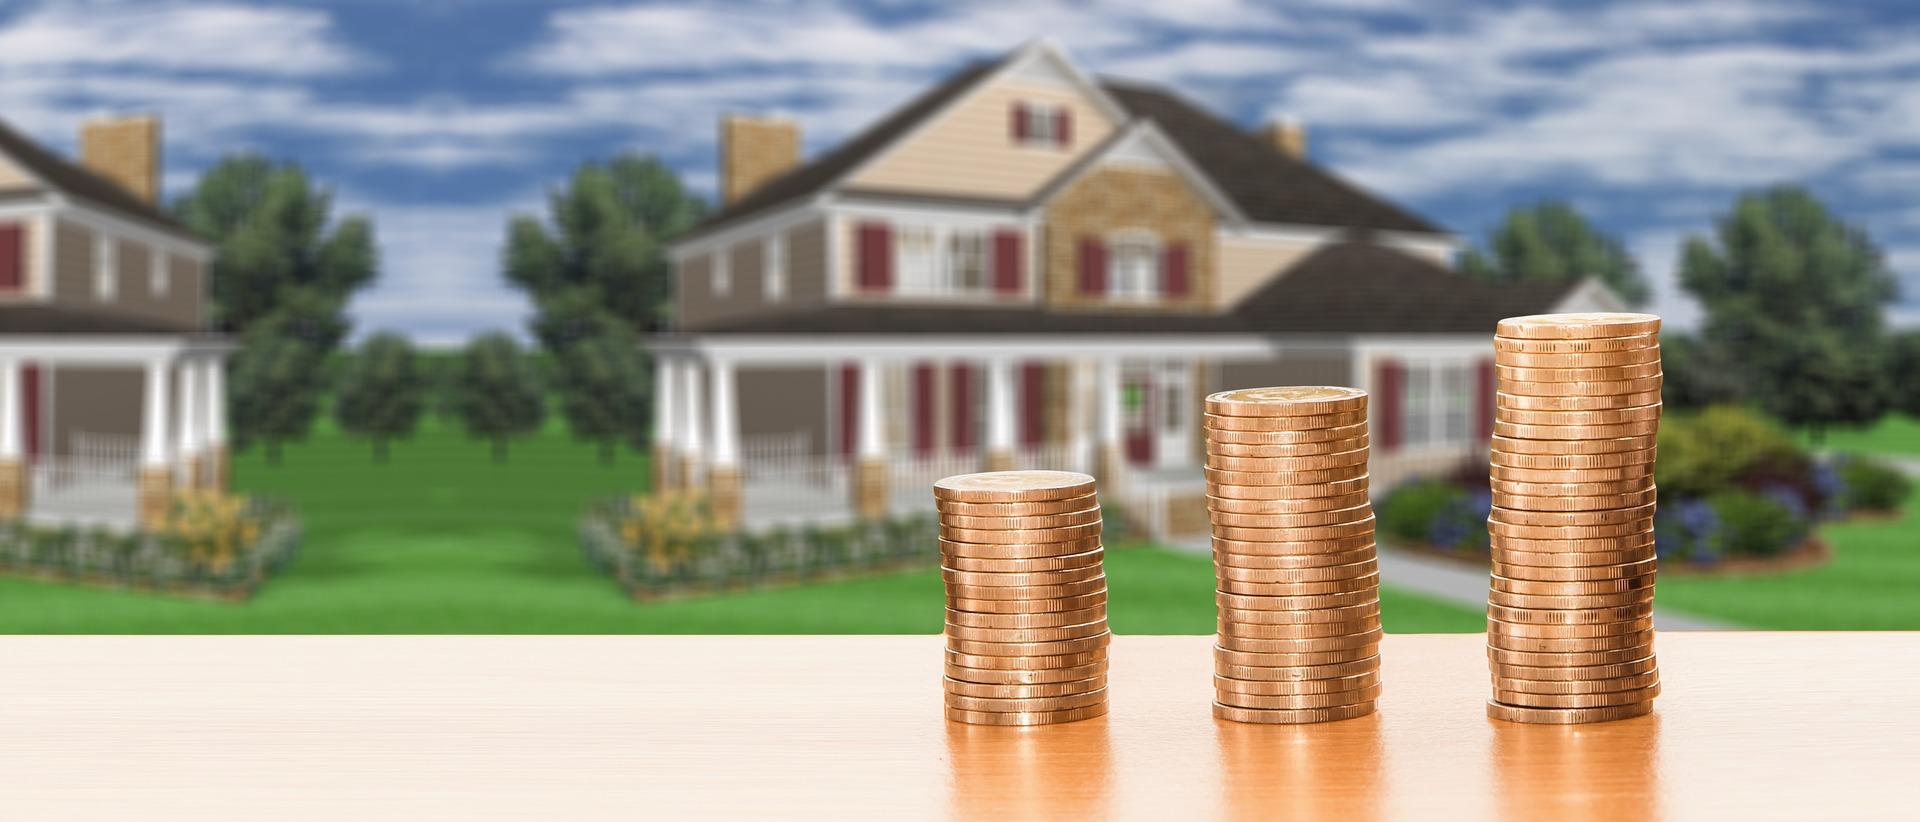 Haus Geld